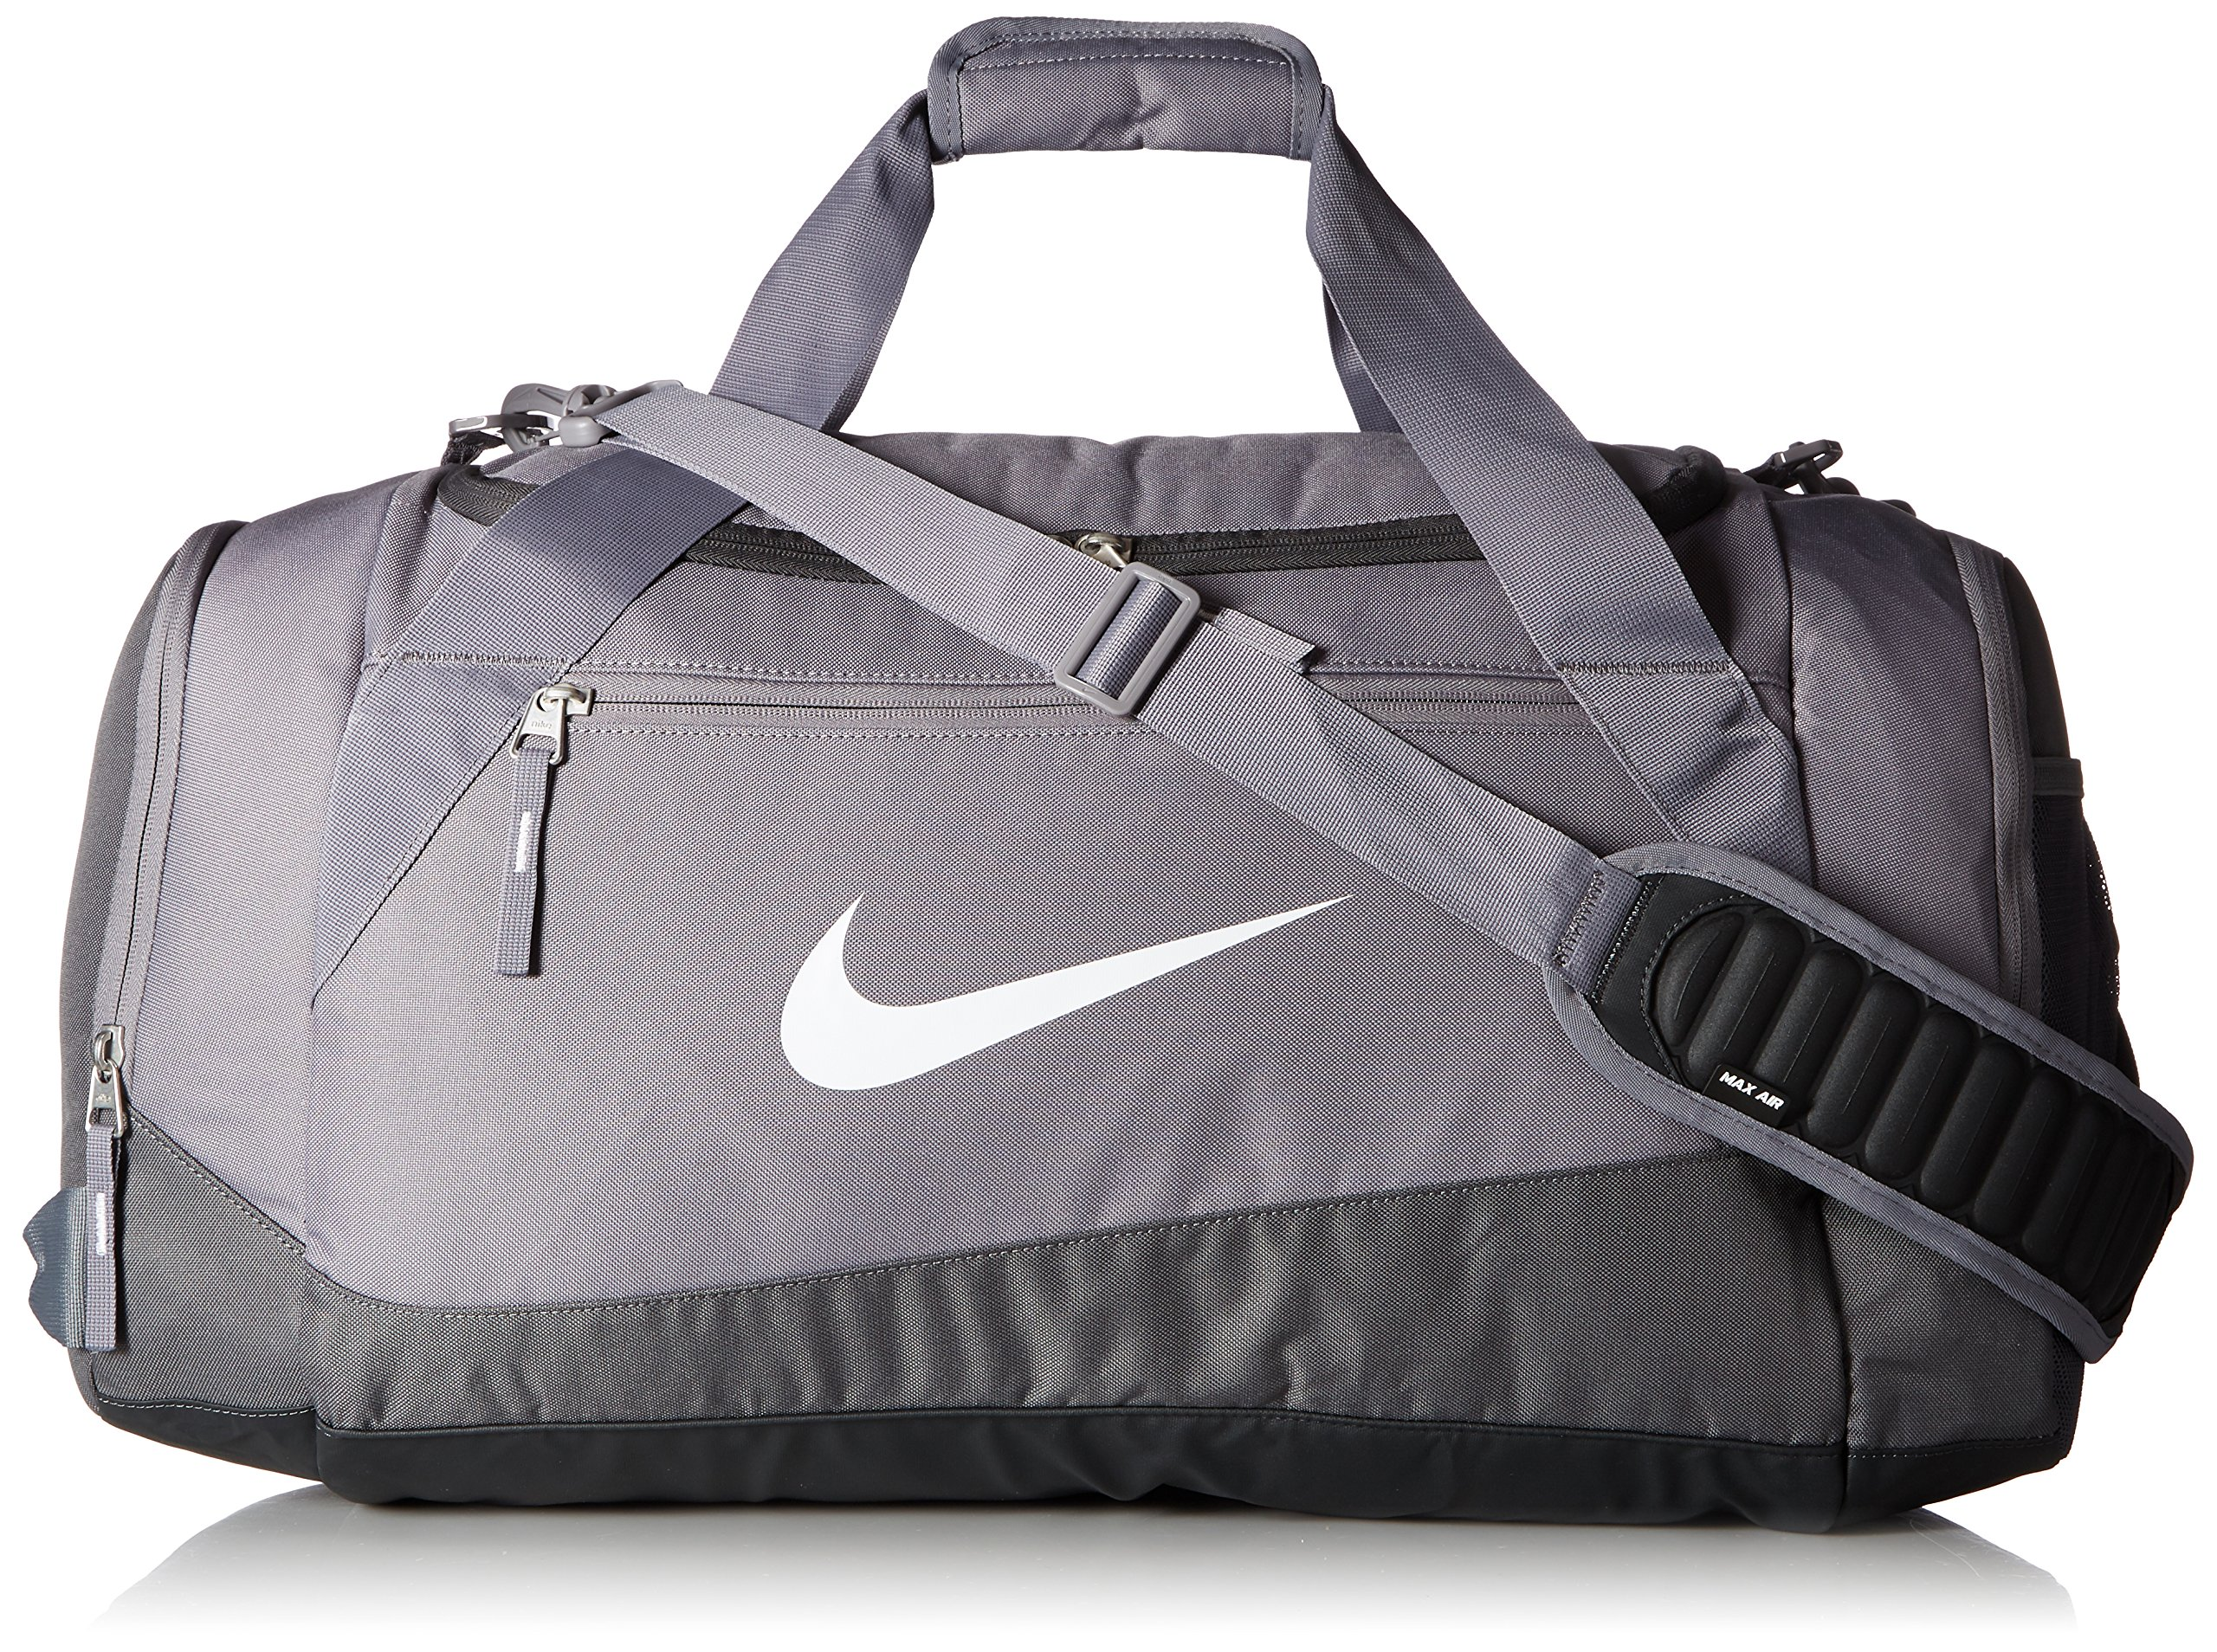 Nike Hoops Elite Max Air (Large) Basketball Duffel Bag